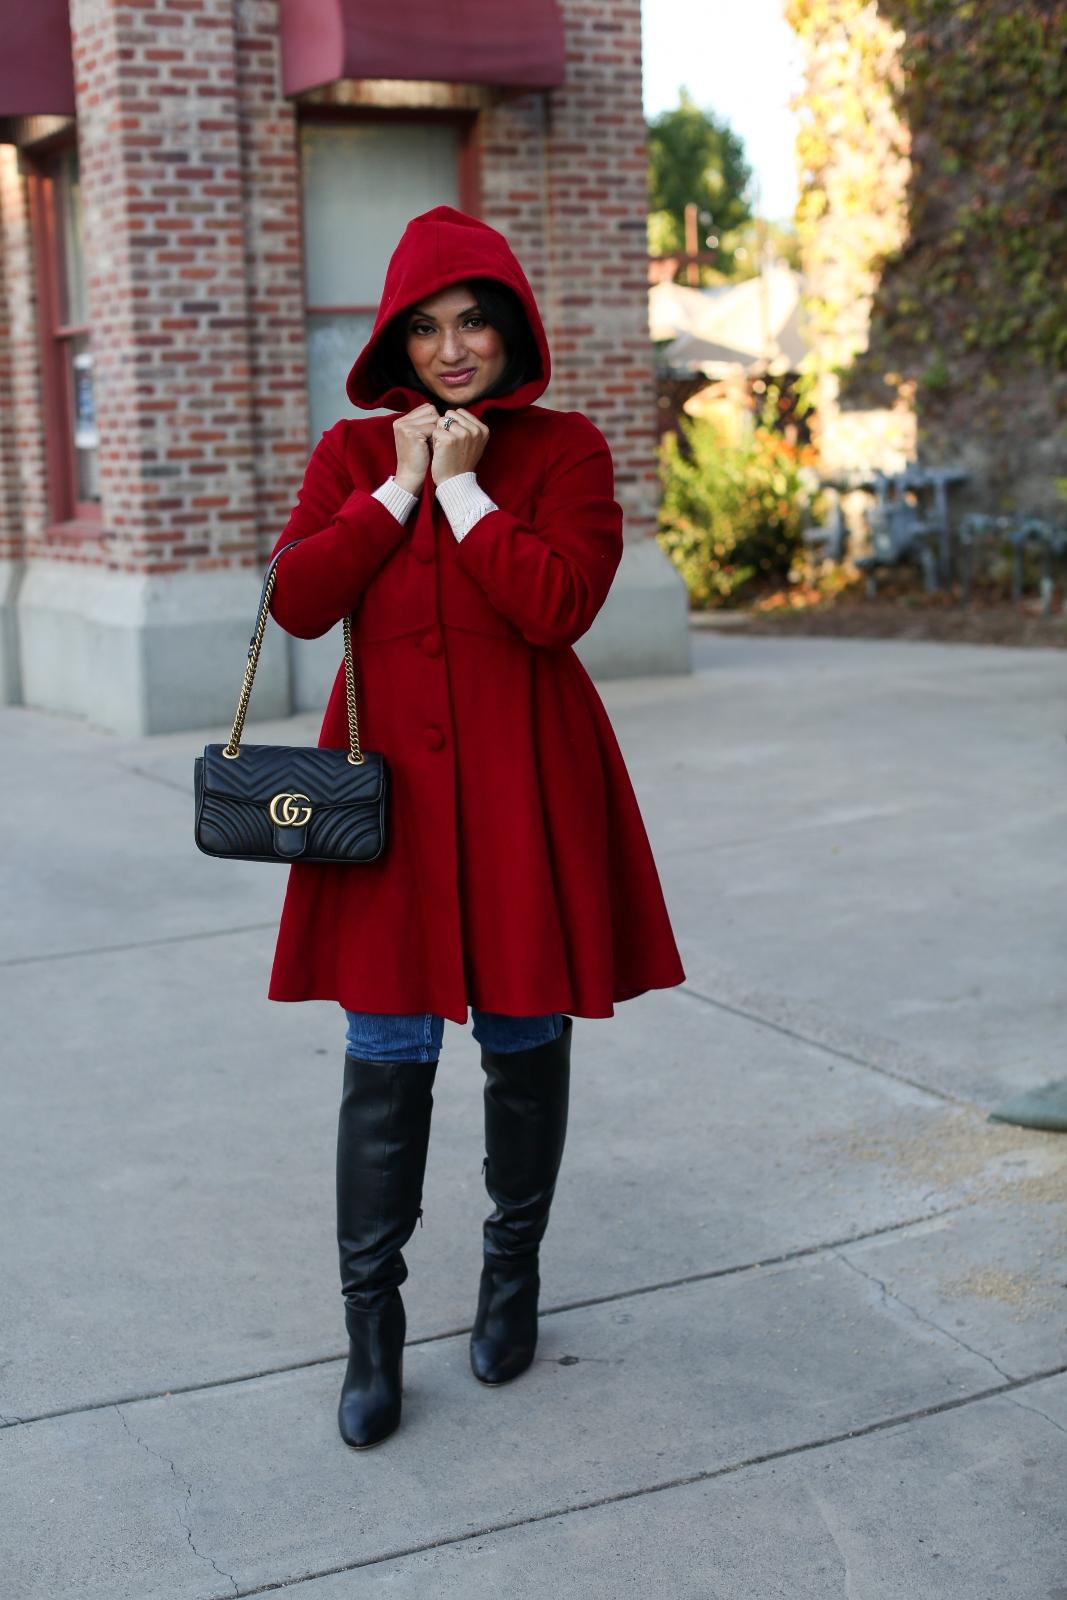 Debbie Savage Orange County California Fashion Blogger Custom Made Hooded Wool Swing Coat